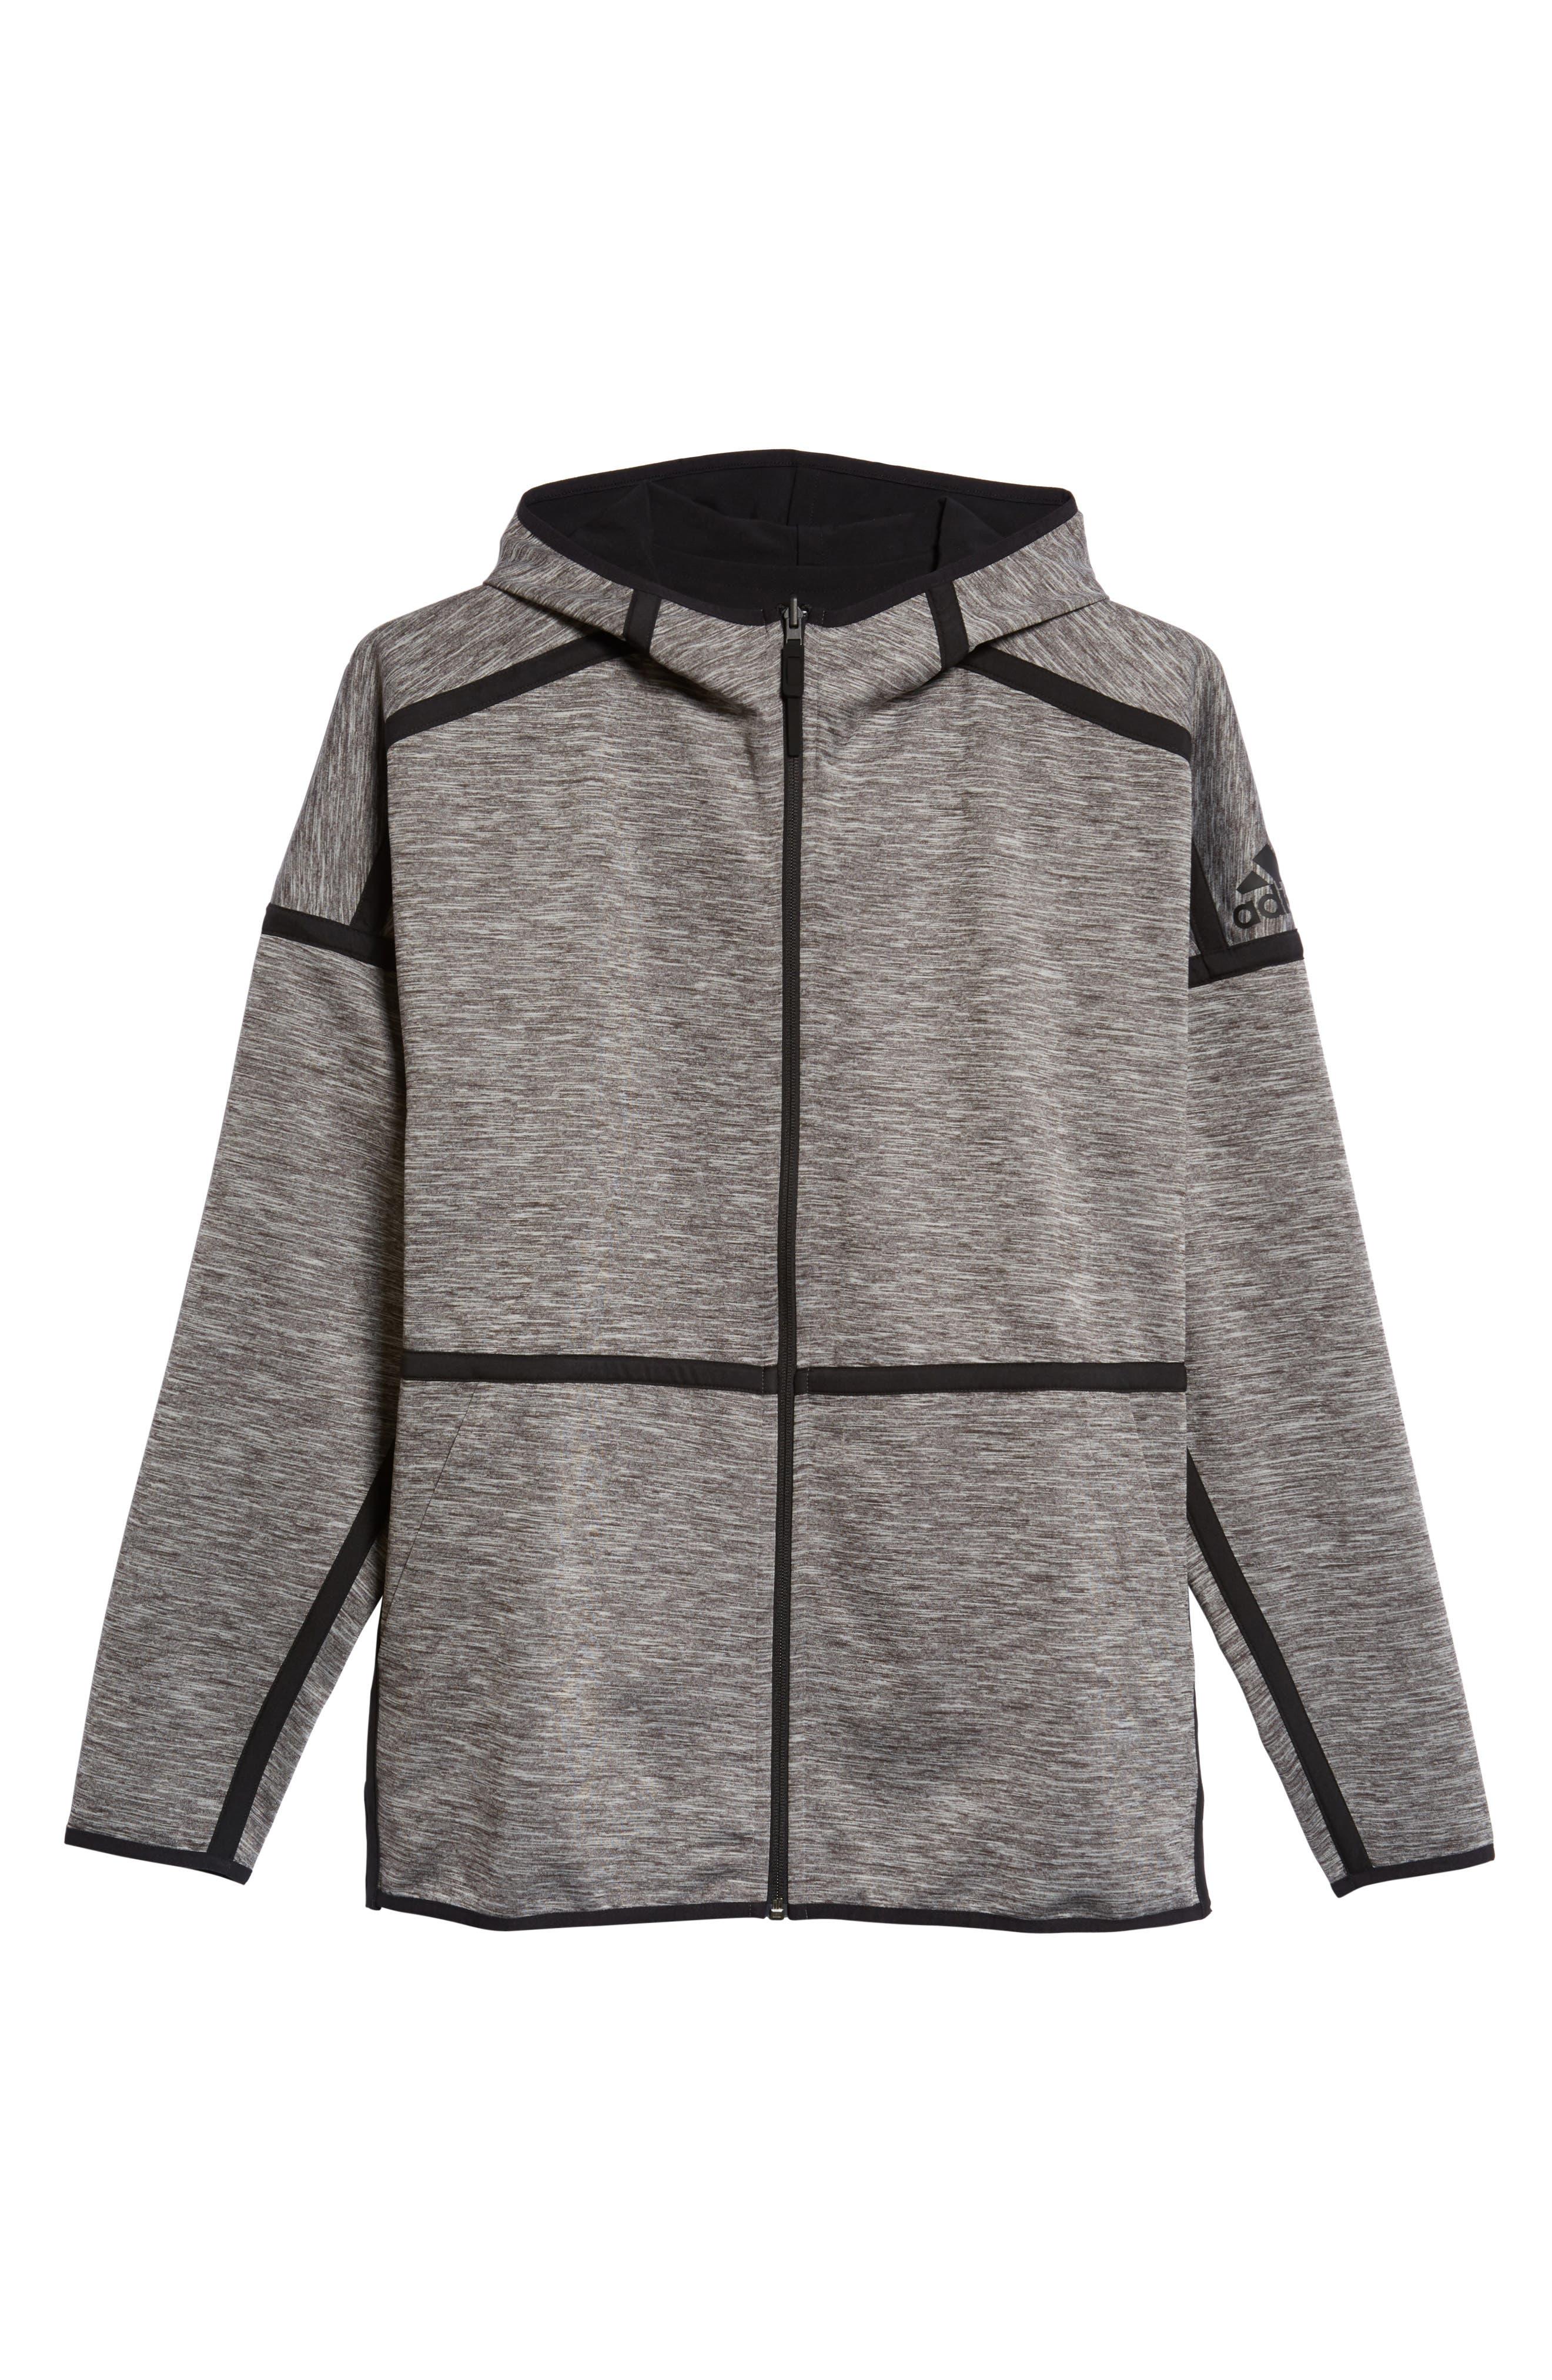 ZNE Regular Fit Reversible Hooded Jacket,                             Alternate thumbnail 7, color,                             Black / Storm Heather/ Mgh